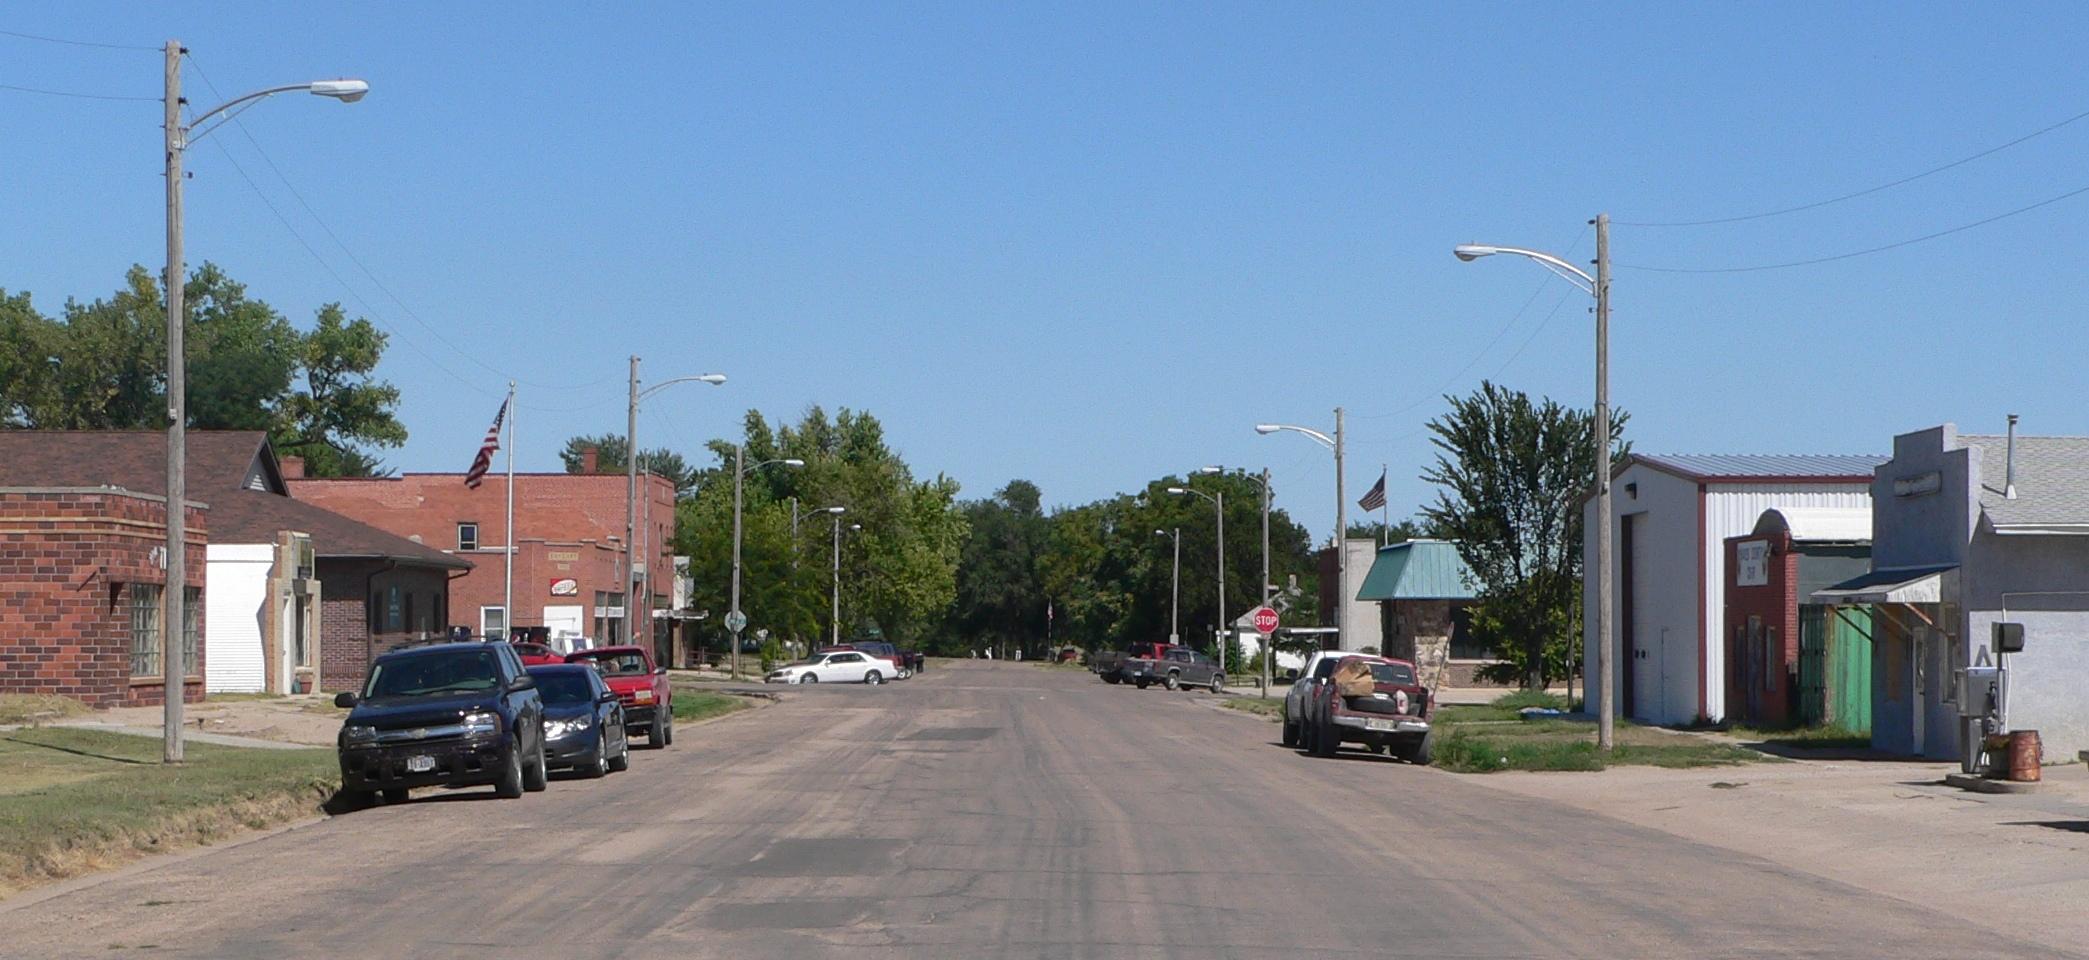 File:Hayes Center, Nebraska Tate Street 2.JPG - Wikimedia ...